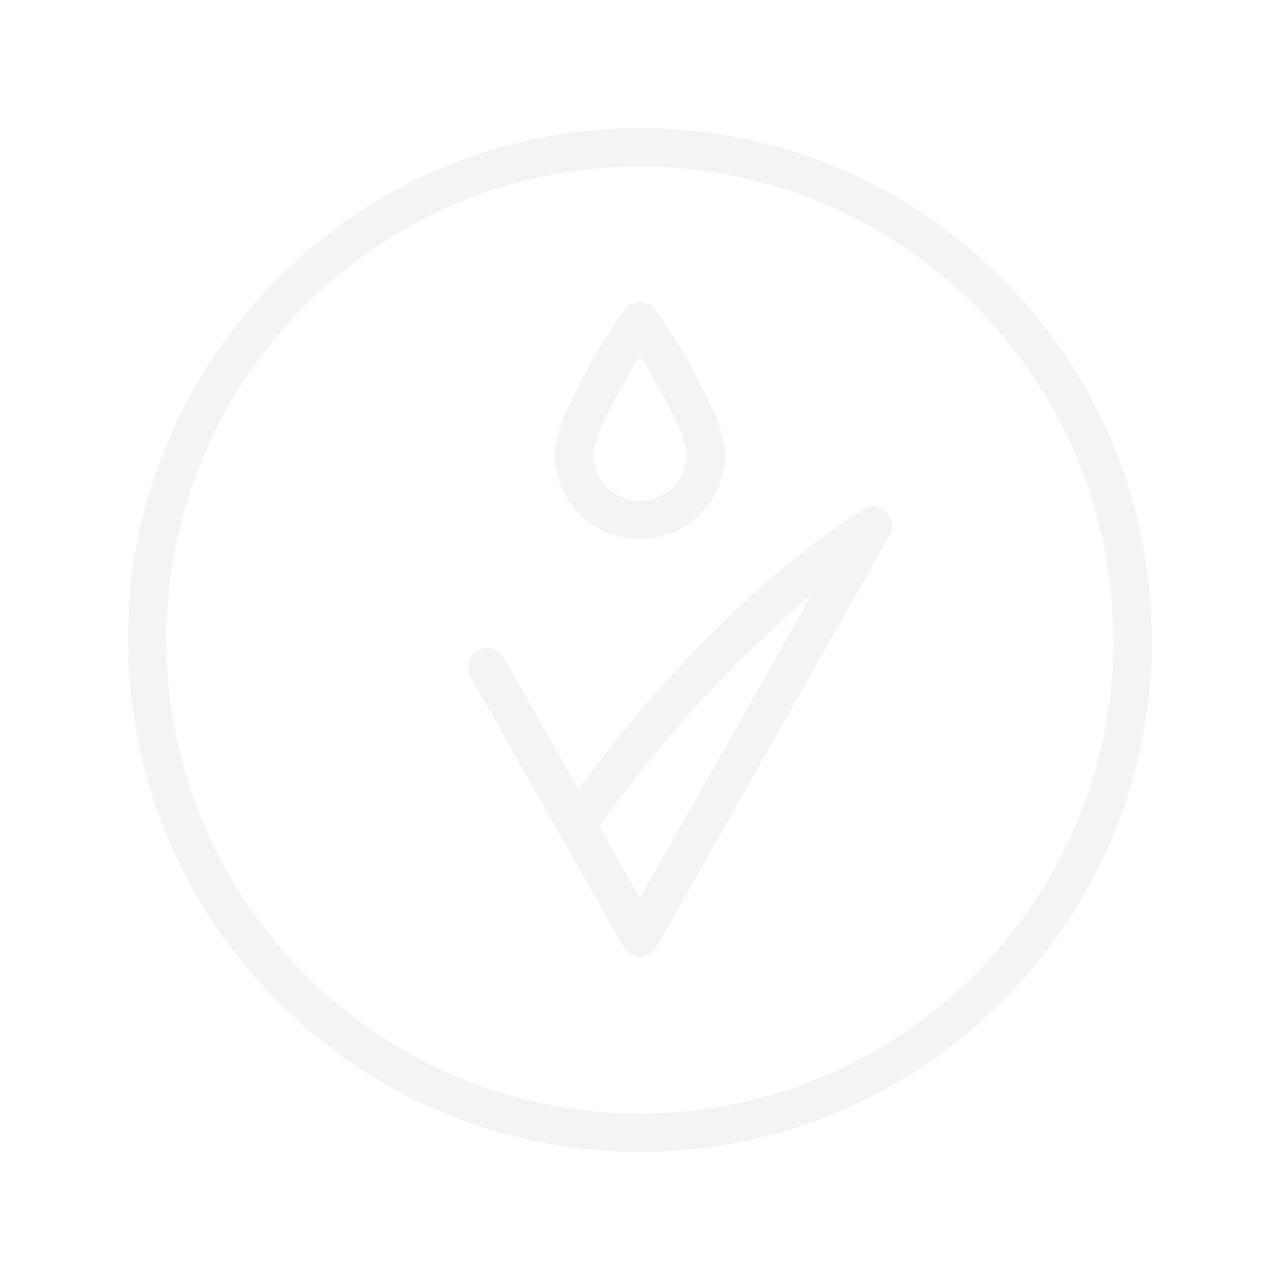 HOLIKA HOLIKA Biotin Damage Care Shampoo шампунь с биотином для поврежденных волос 400ml